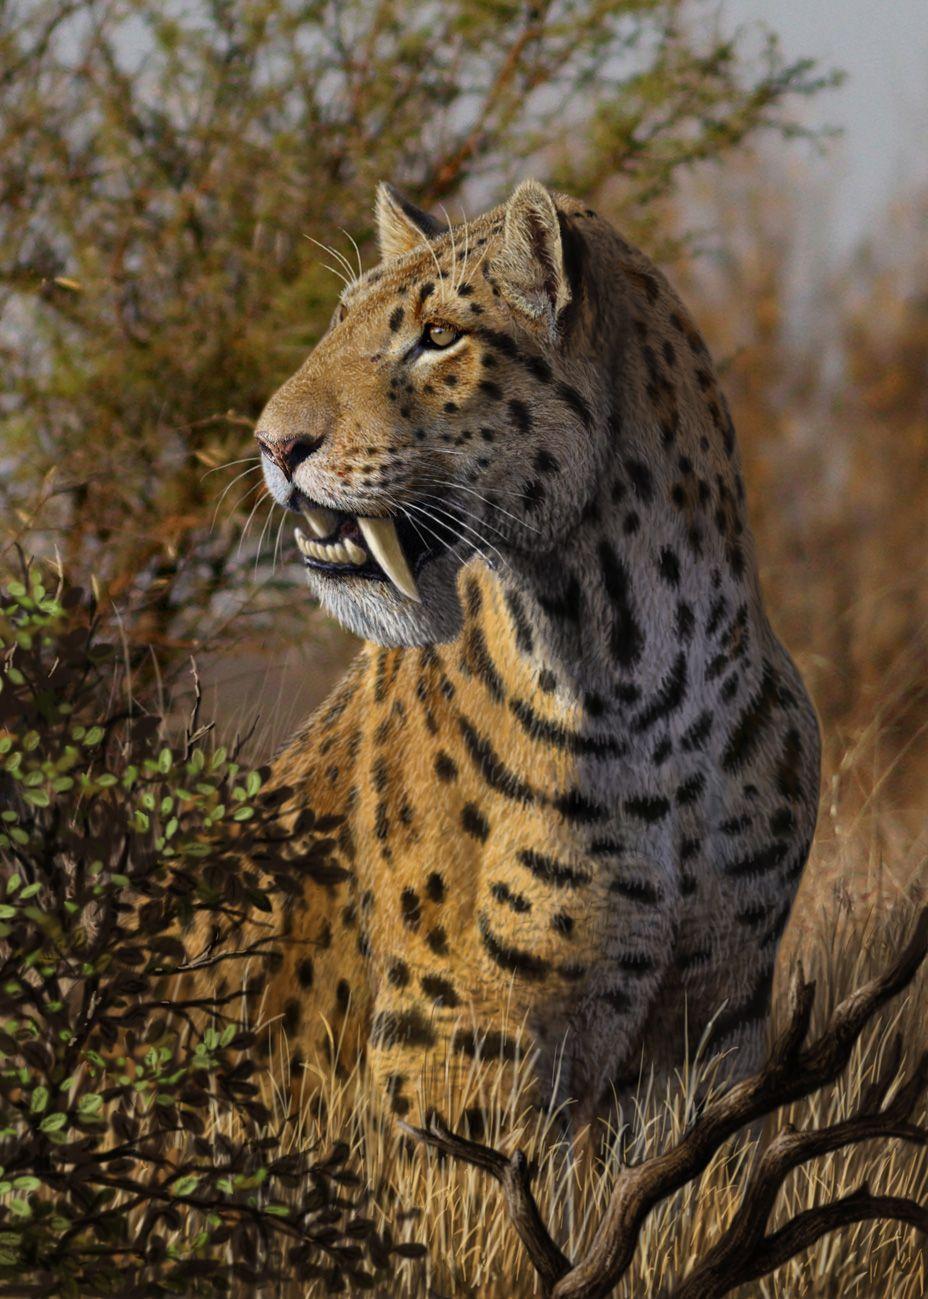 هل تعلم Toronto zoo, Big cats, Endangered species